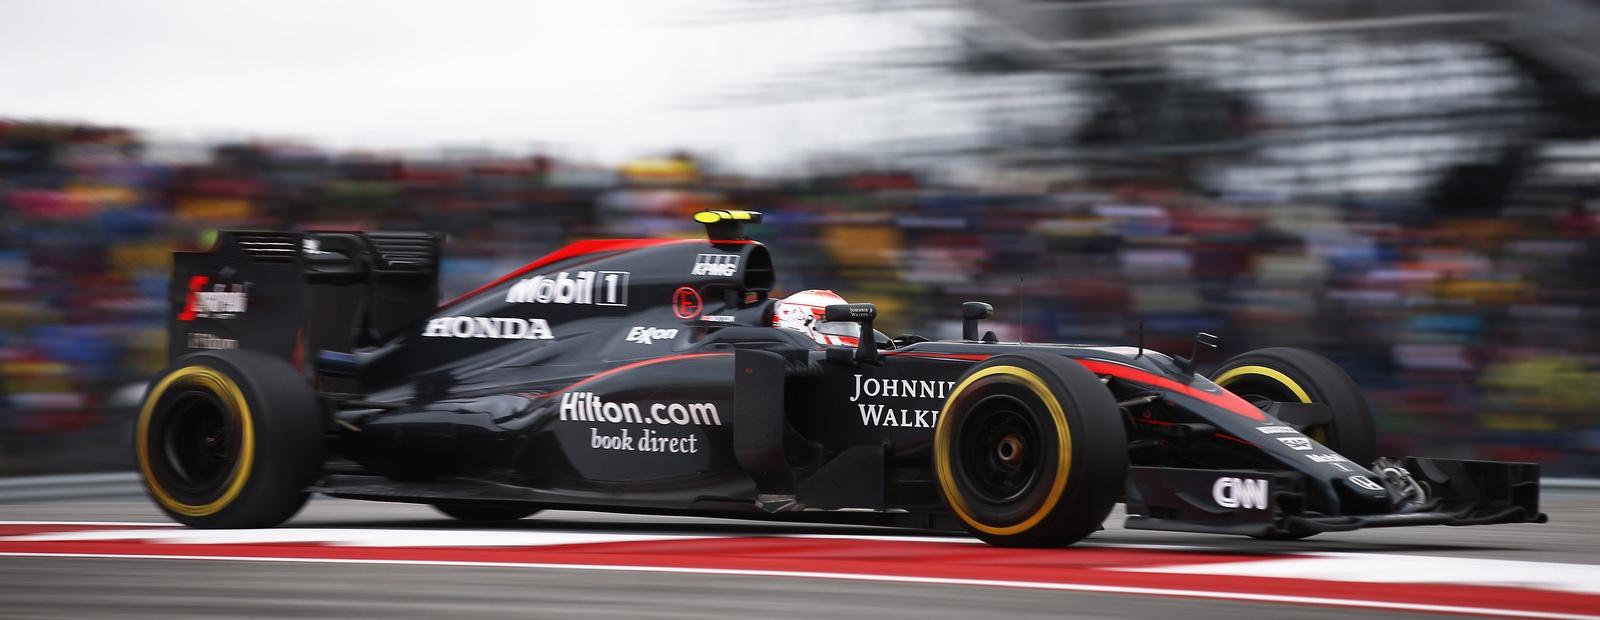 mclaren formula 1 - 2015 united states grand prix qualifying & race